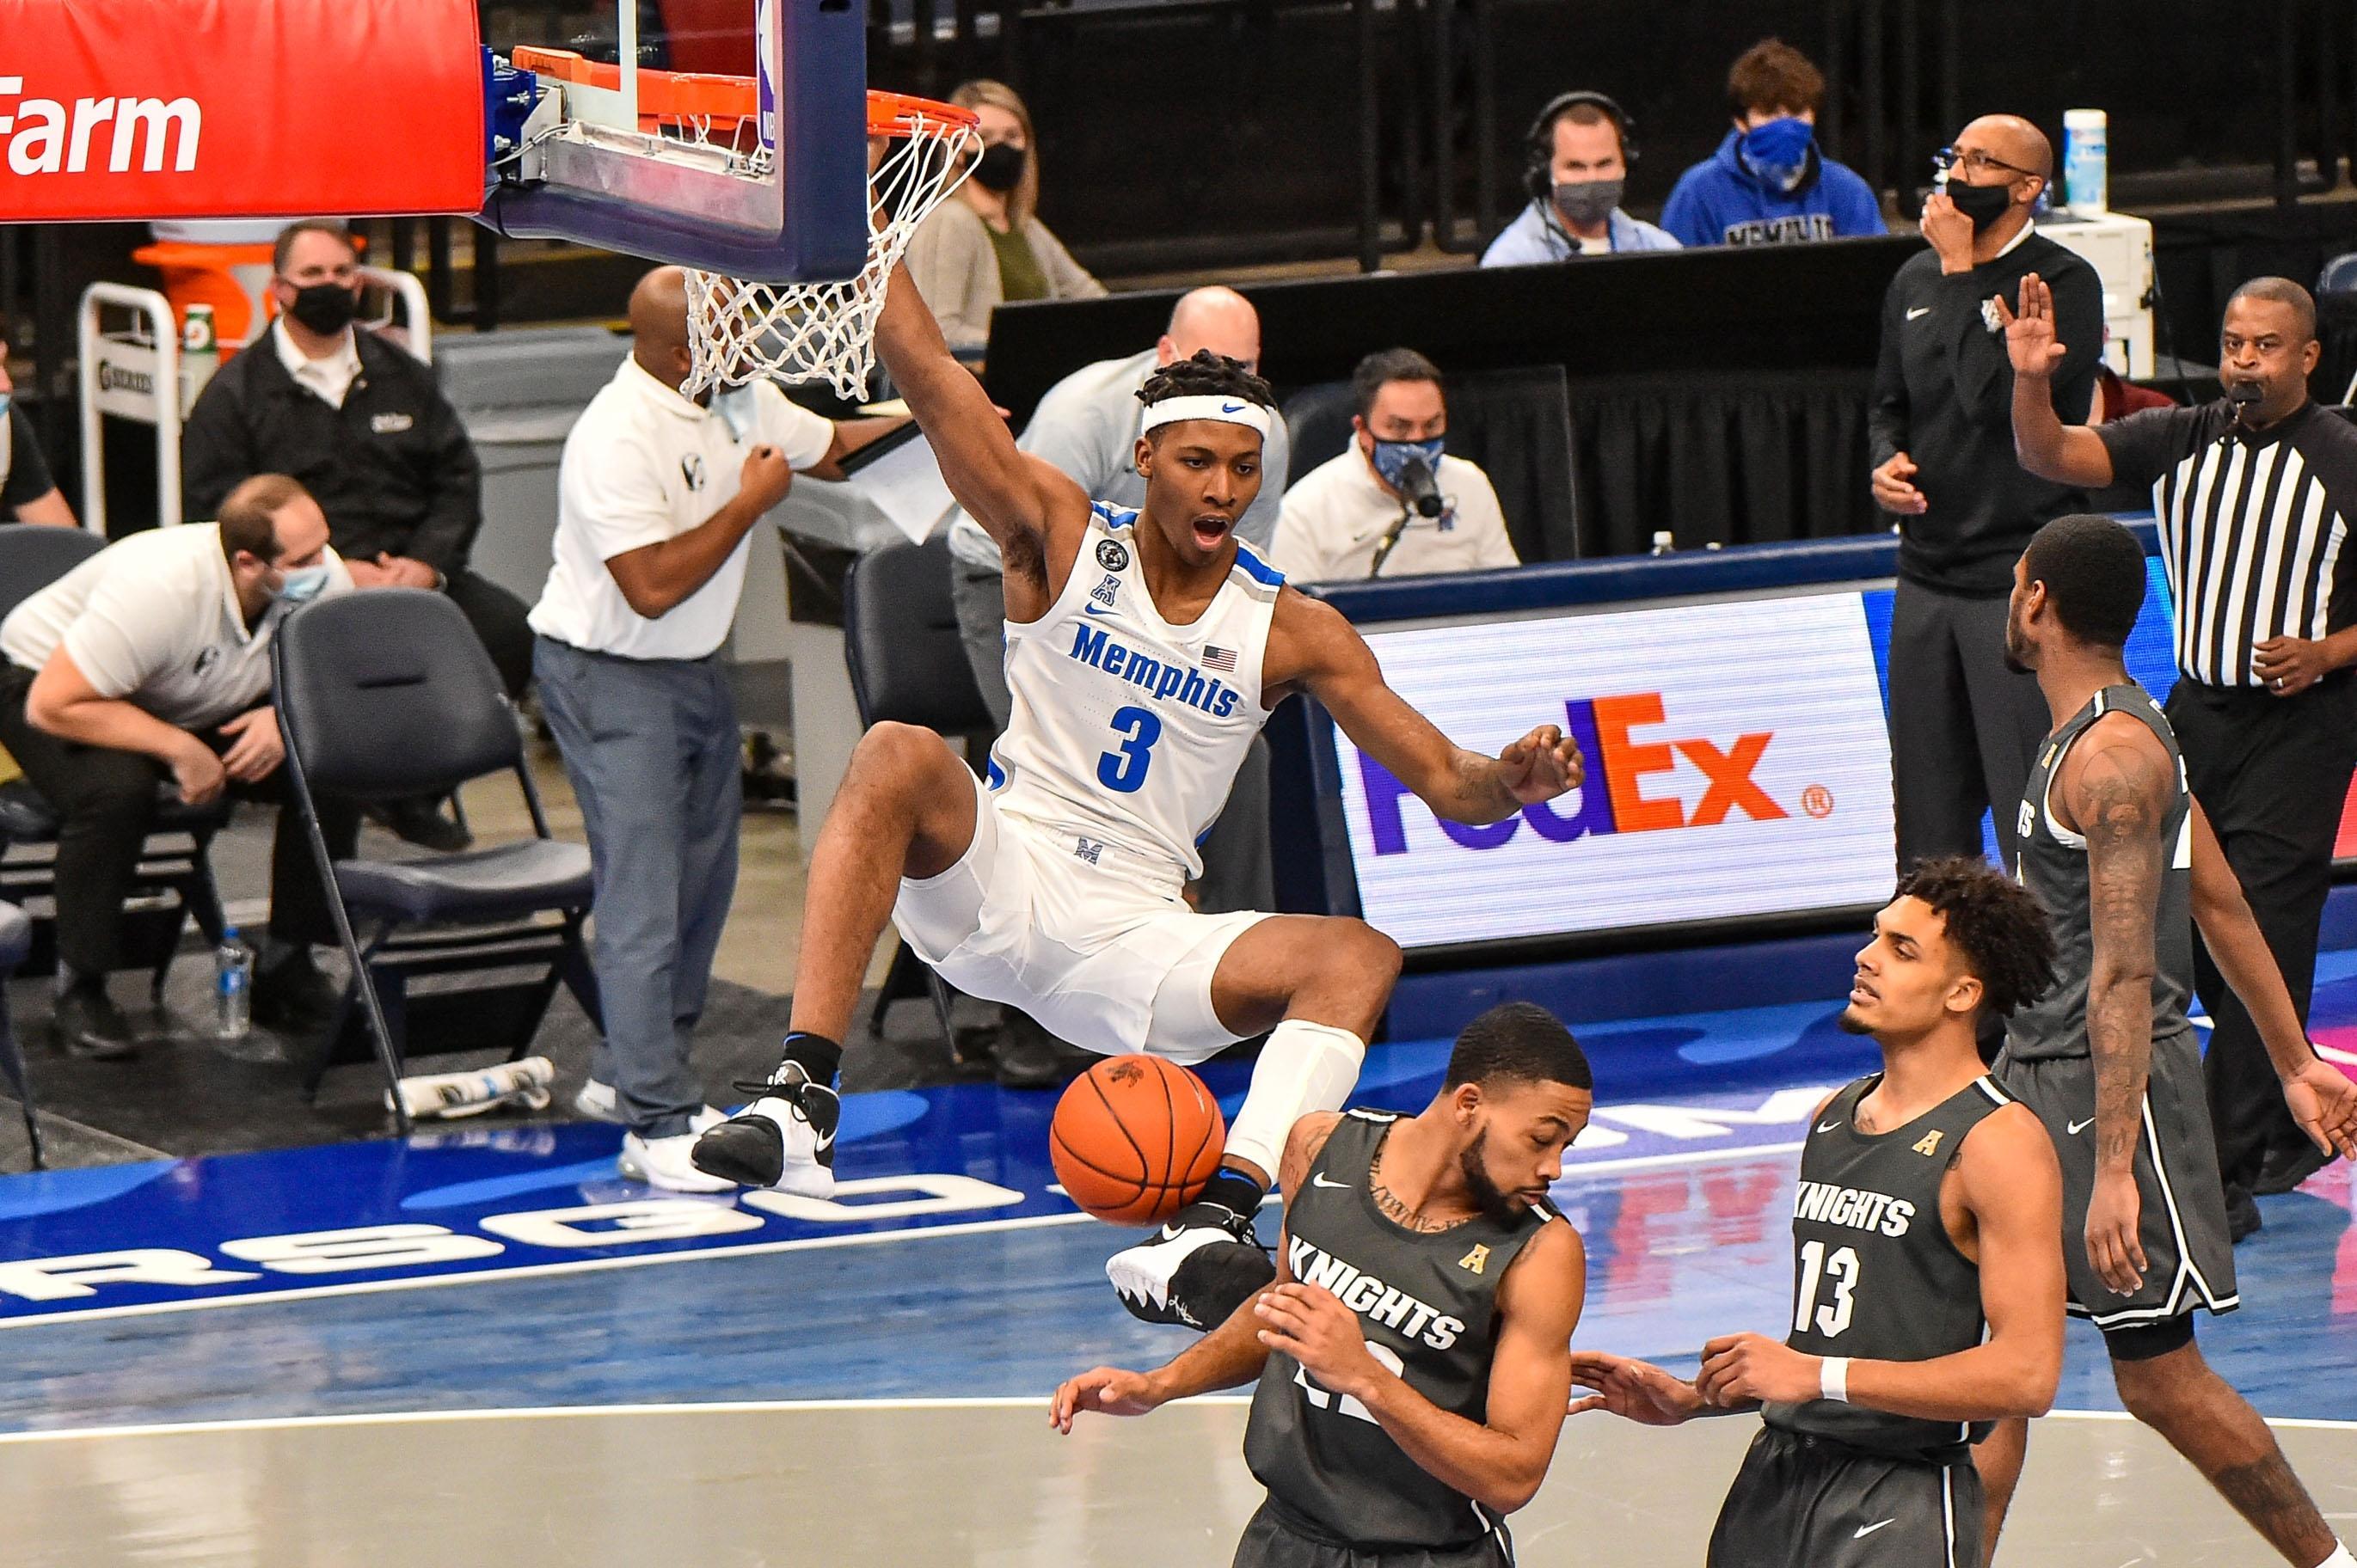 Landers Nolley II led Memphis in scoring last season.